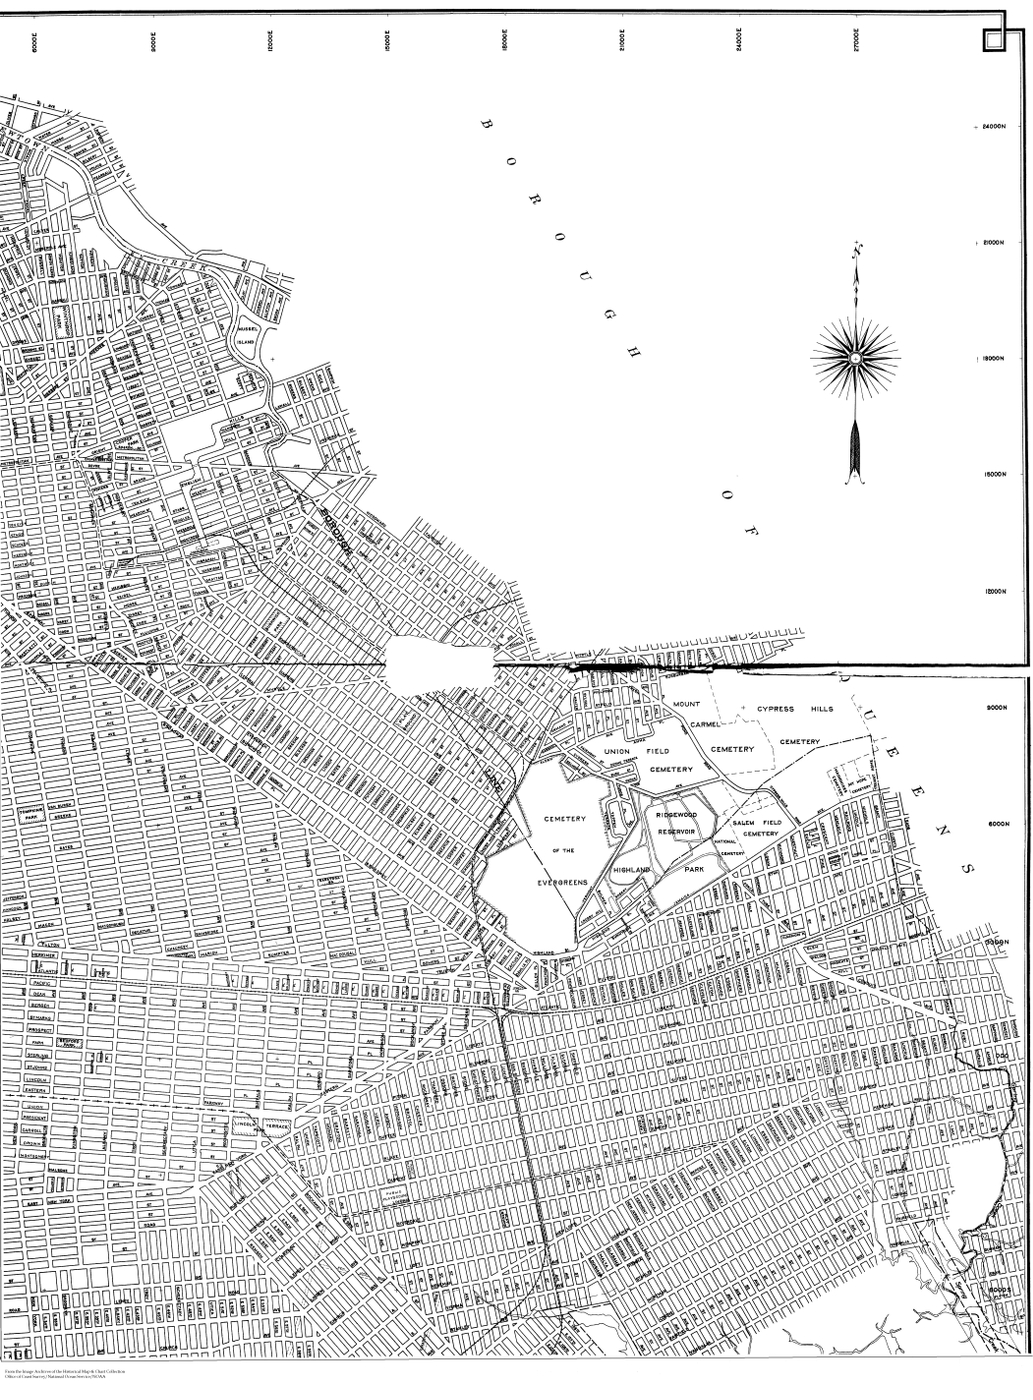 [map] [brooklyn] [new york] BOQ